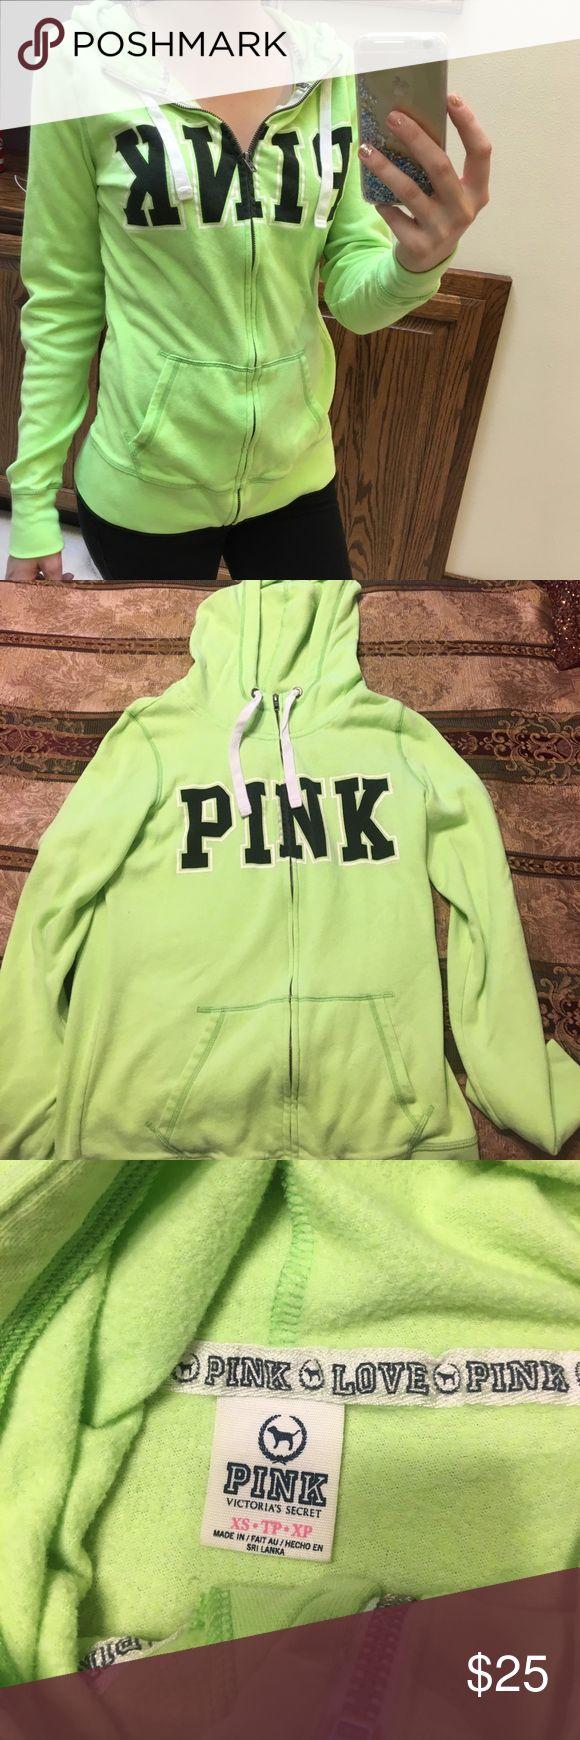 PINK Victoria's Secret lime green zip up hoodie Perfect condition! PINK Victoria's Secret Jackets & Coats